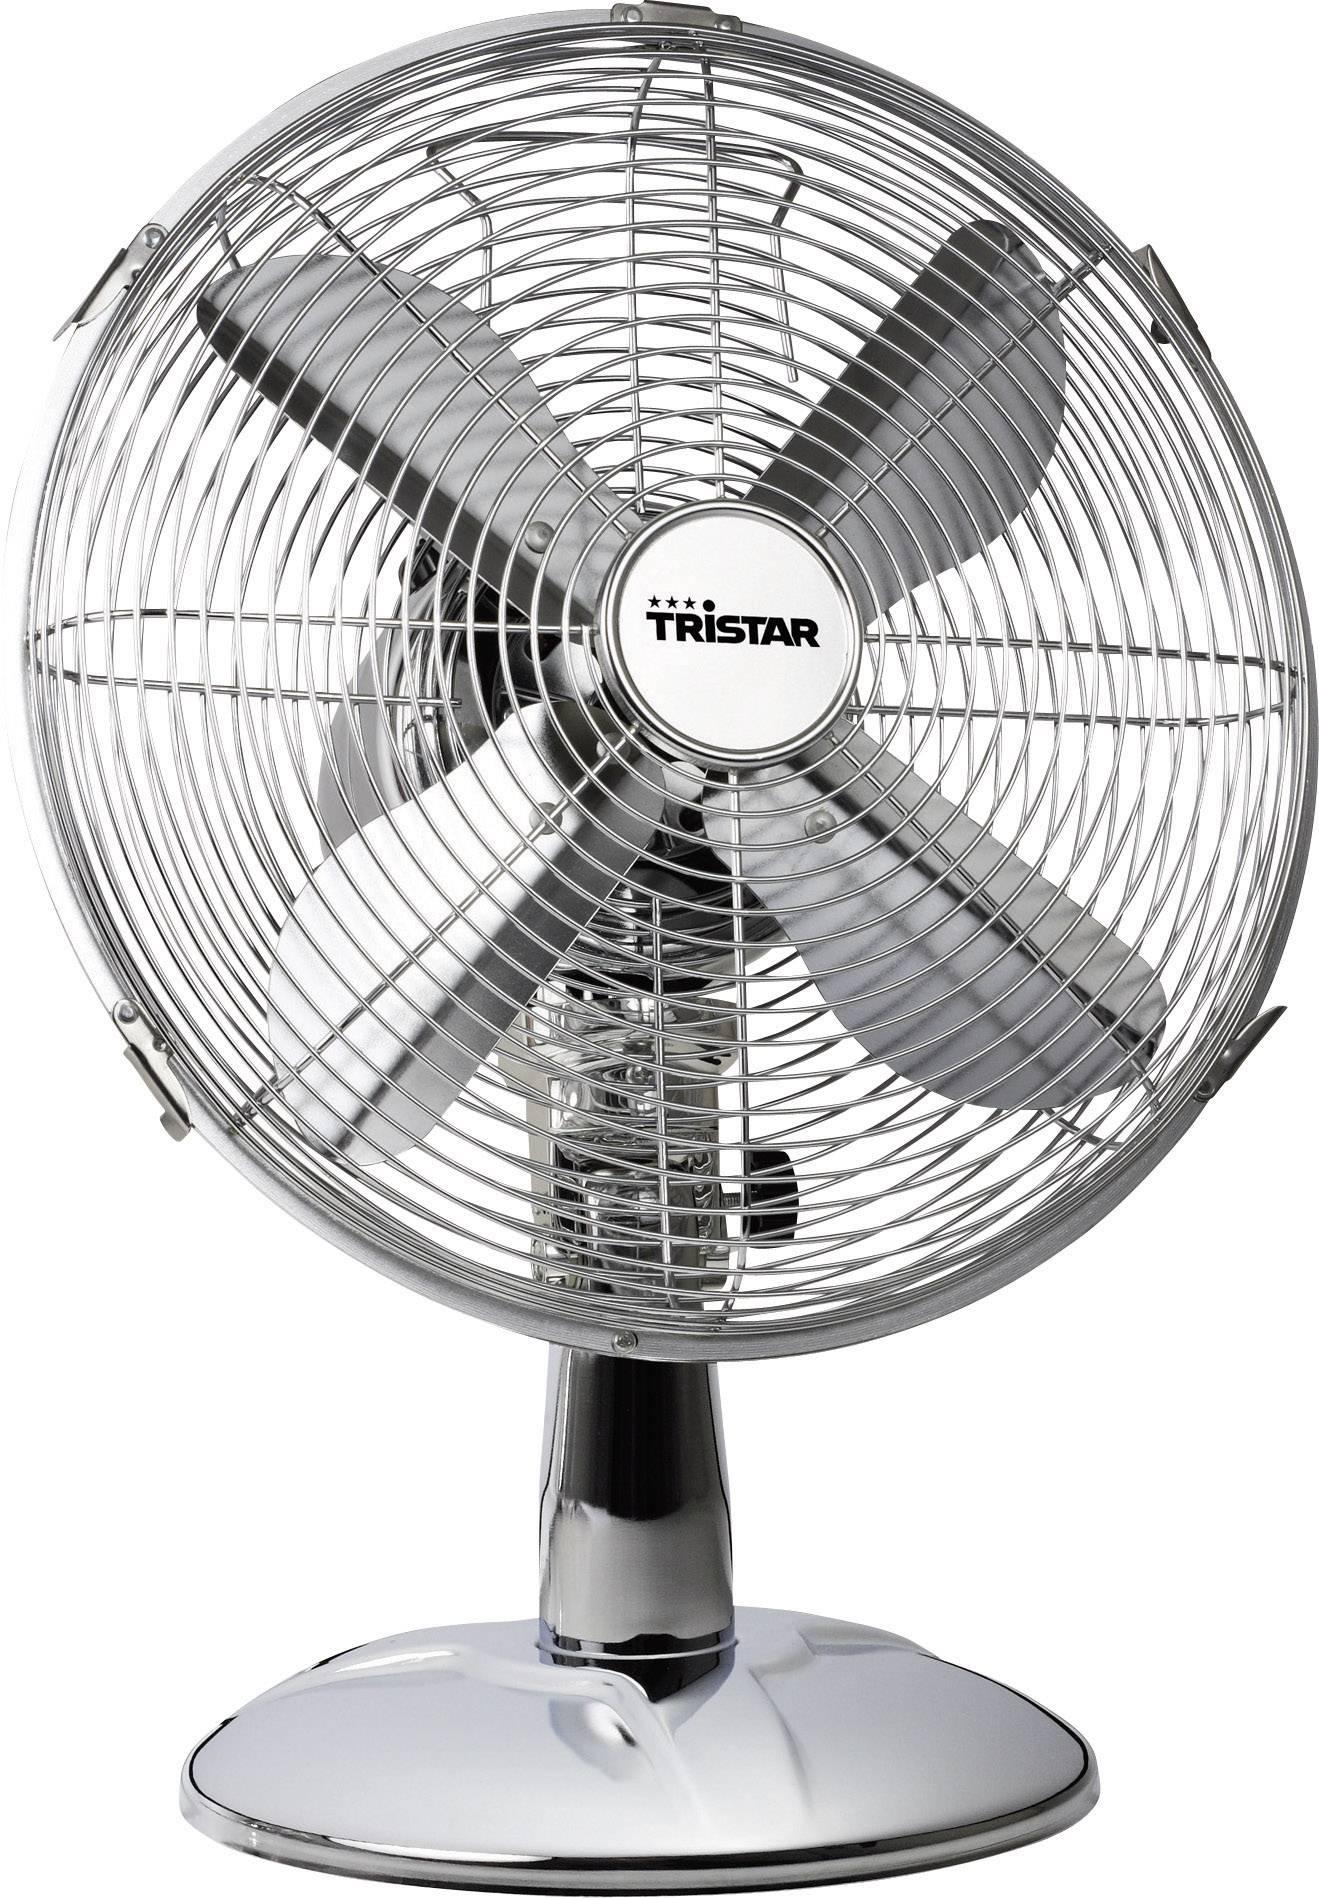 Stolný ventilátor Tristar VE-5953, 30 cm